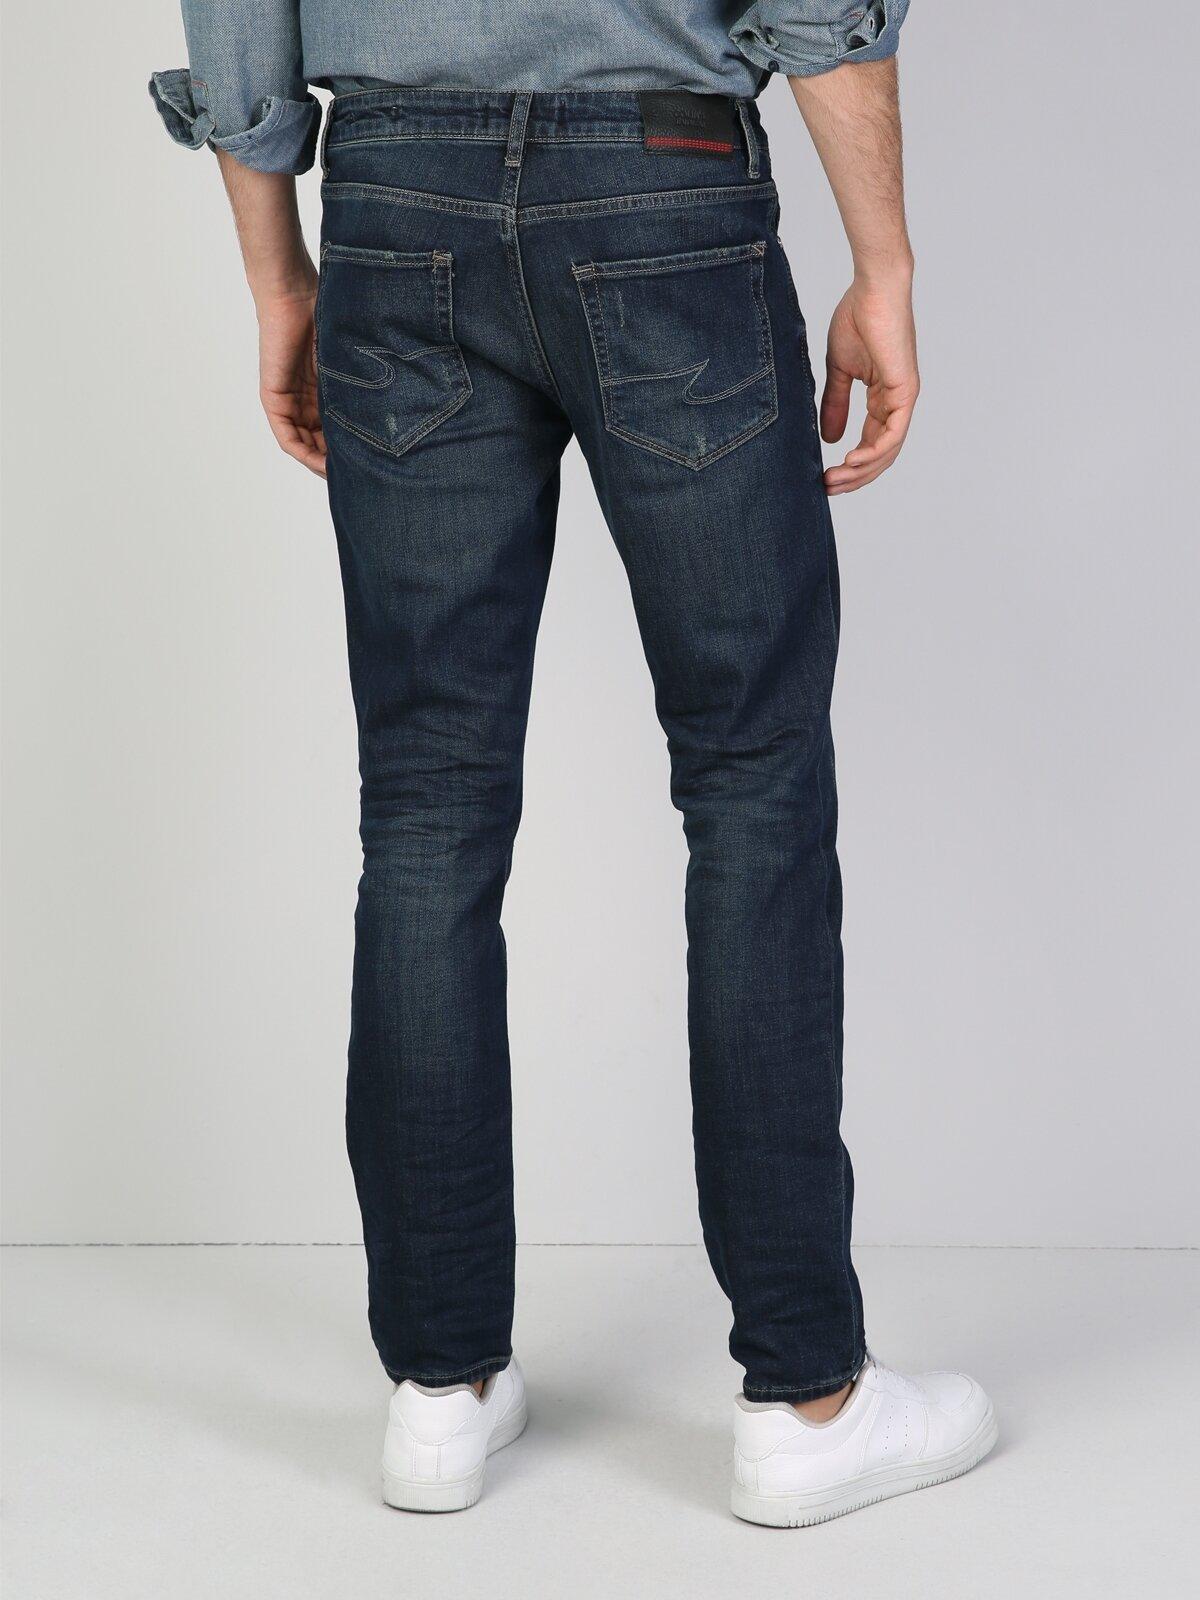 044 Karl Normal Kesim   Siyah Jean Pantolon